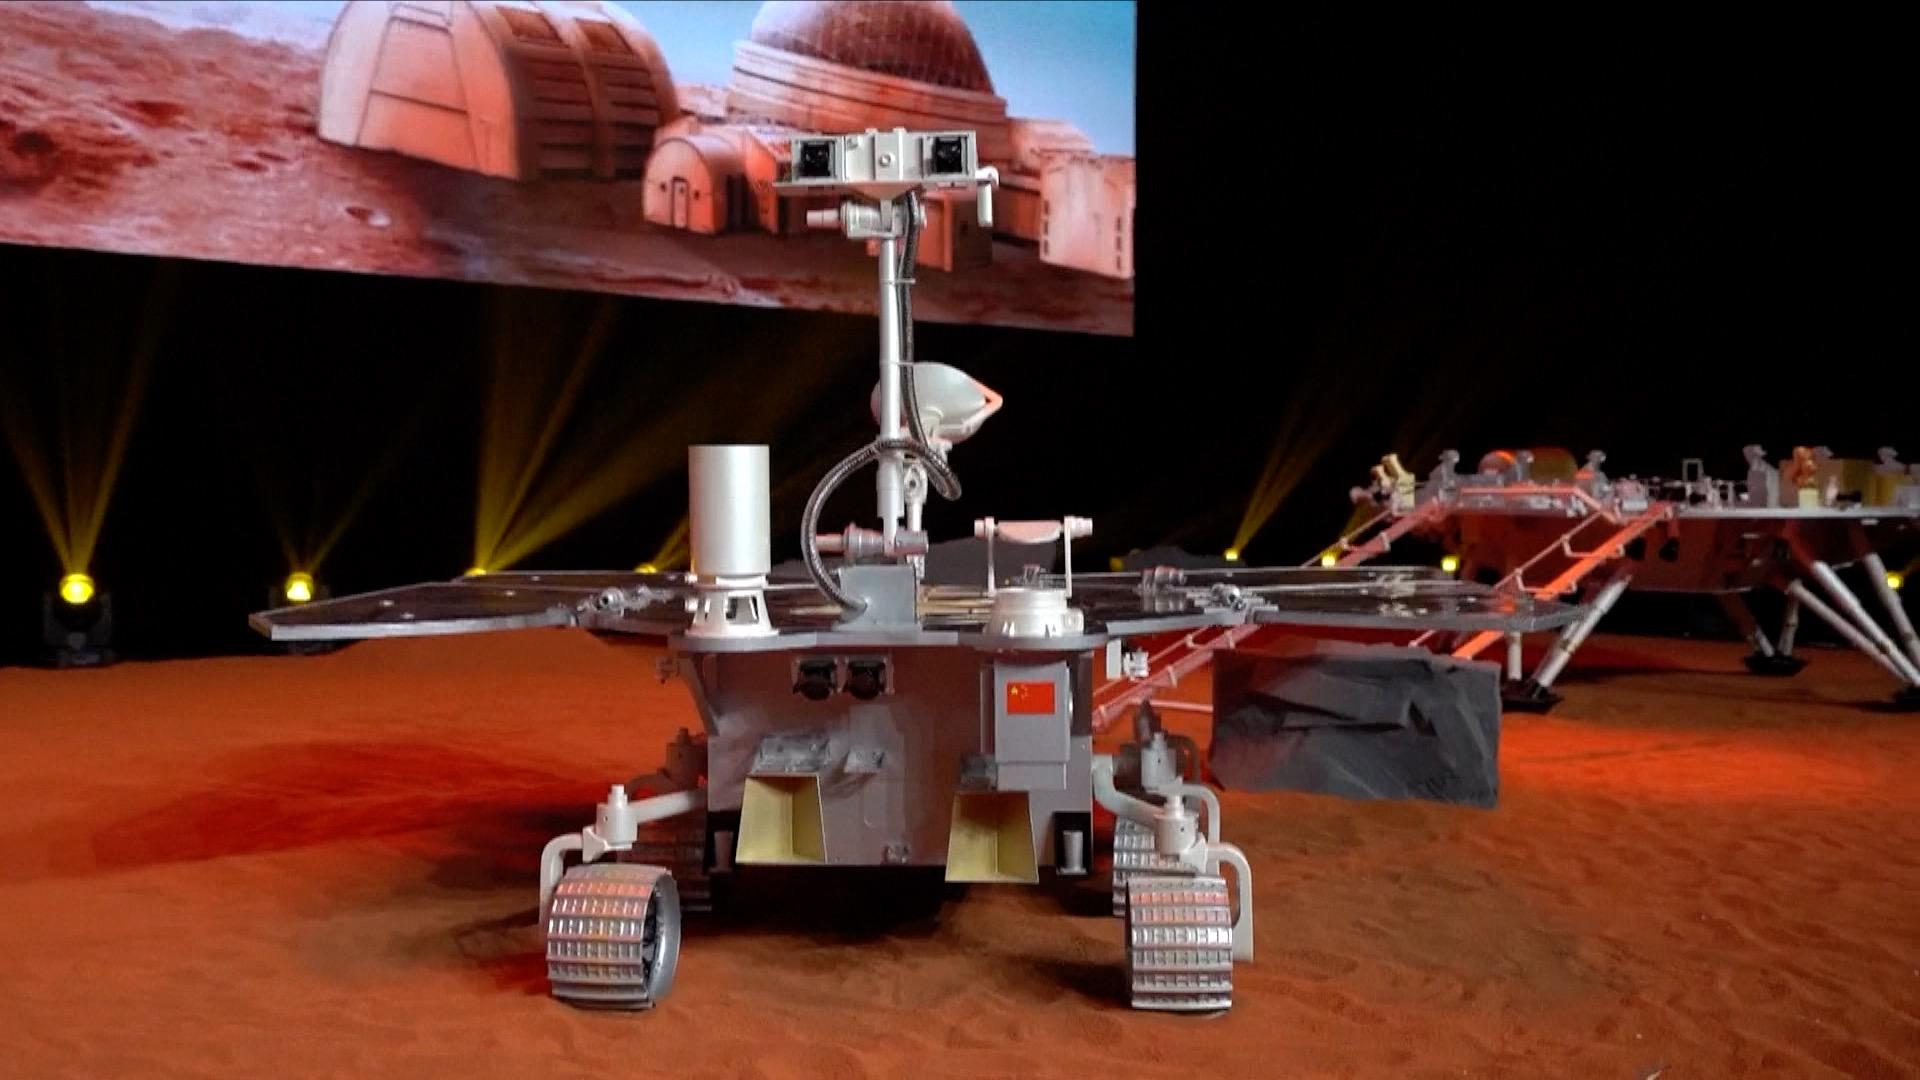 China's Mars probe travels 155 million km